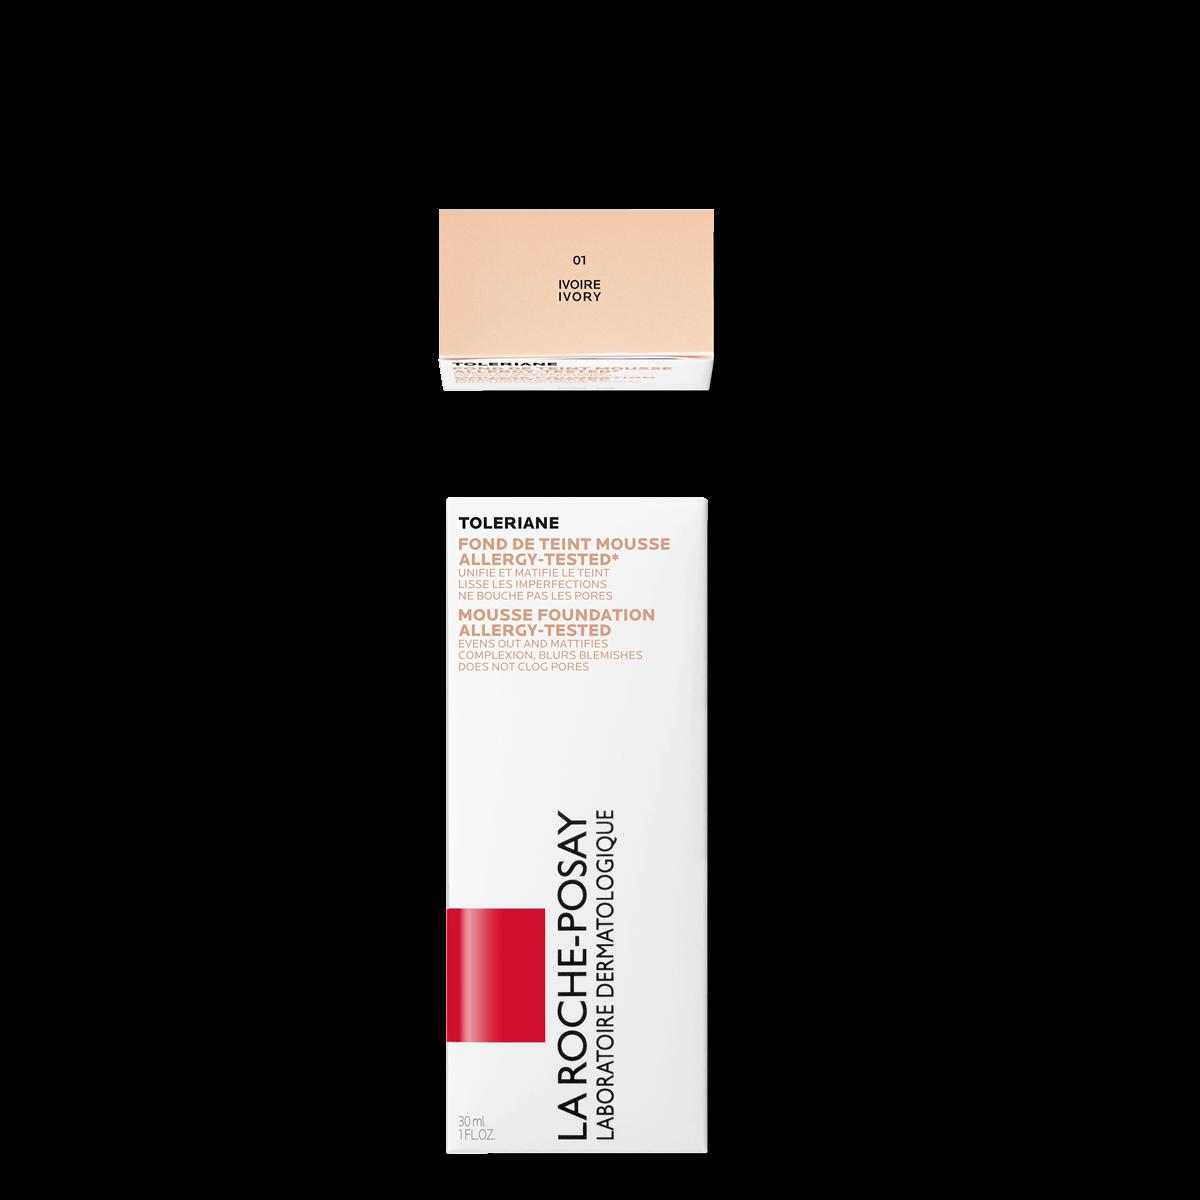 La Roche Posay Sensitive Toleriane Make up MOUSSE FOUNDATION 01IVORY 3